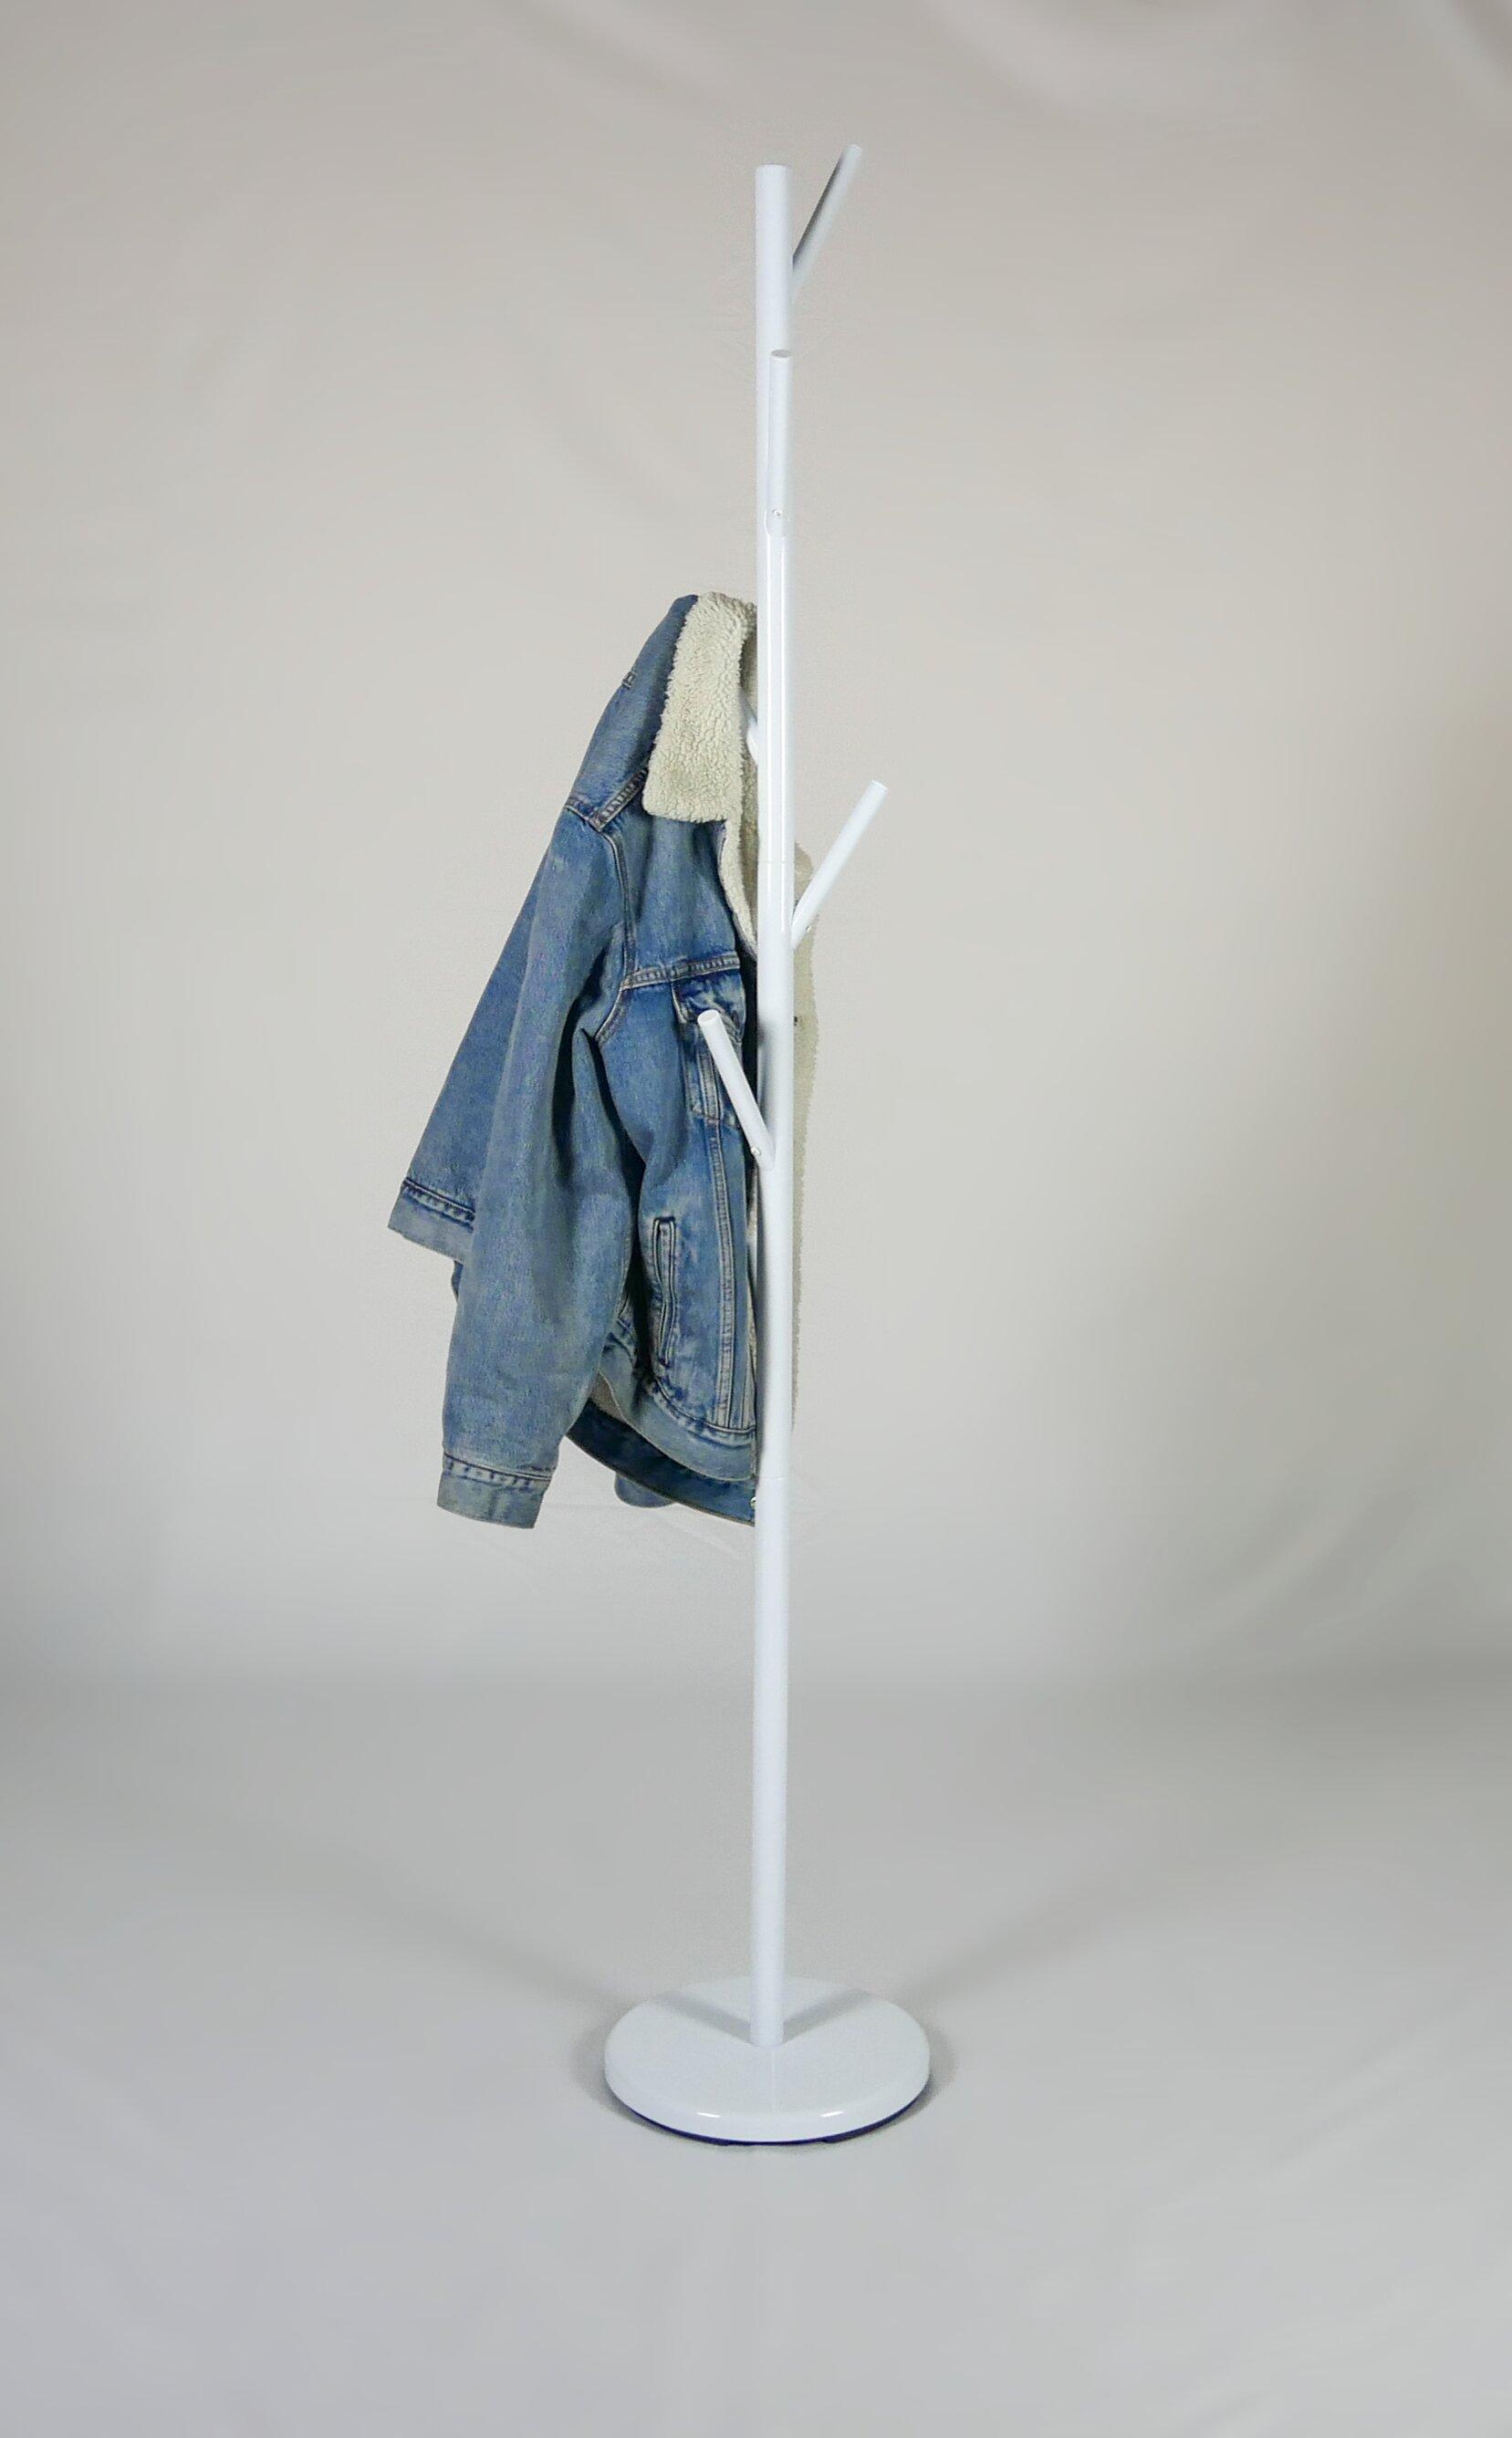 Sleek Chic Modern Coat Racks You Ll Love In 2021 Wayfair